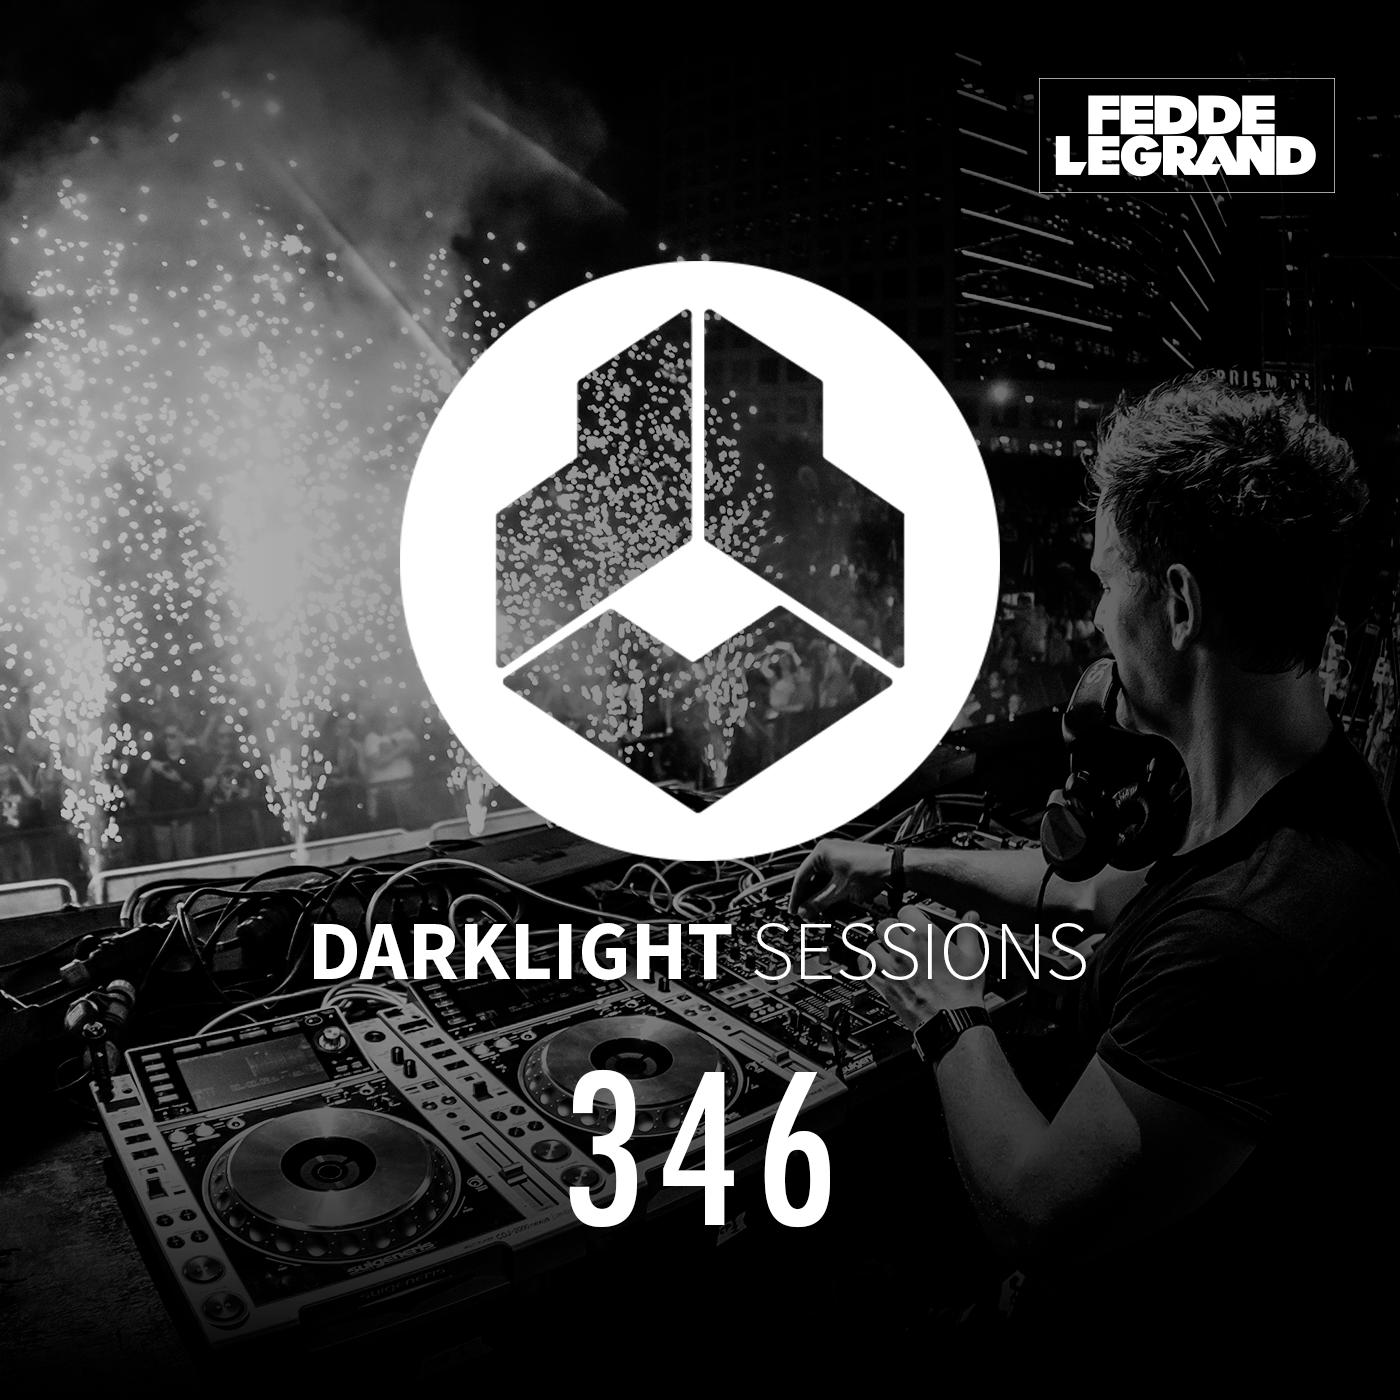 Darklight Sessions 346